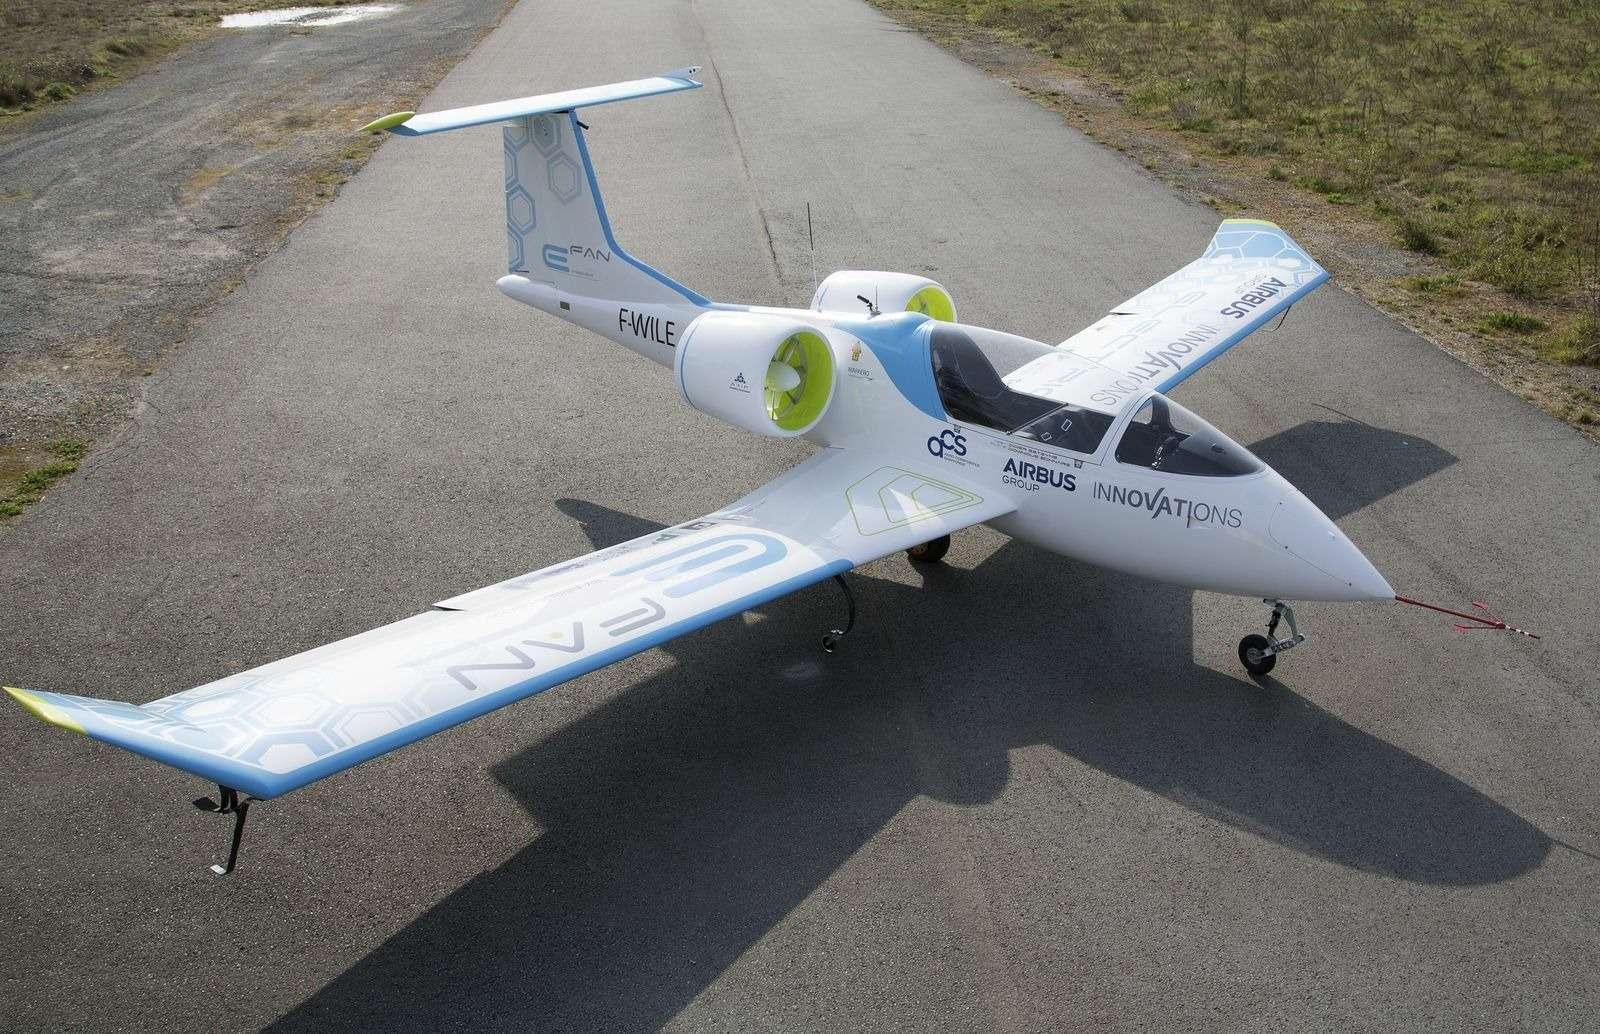 Airbus E-Fun insideevs.com